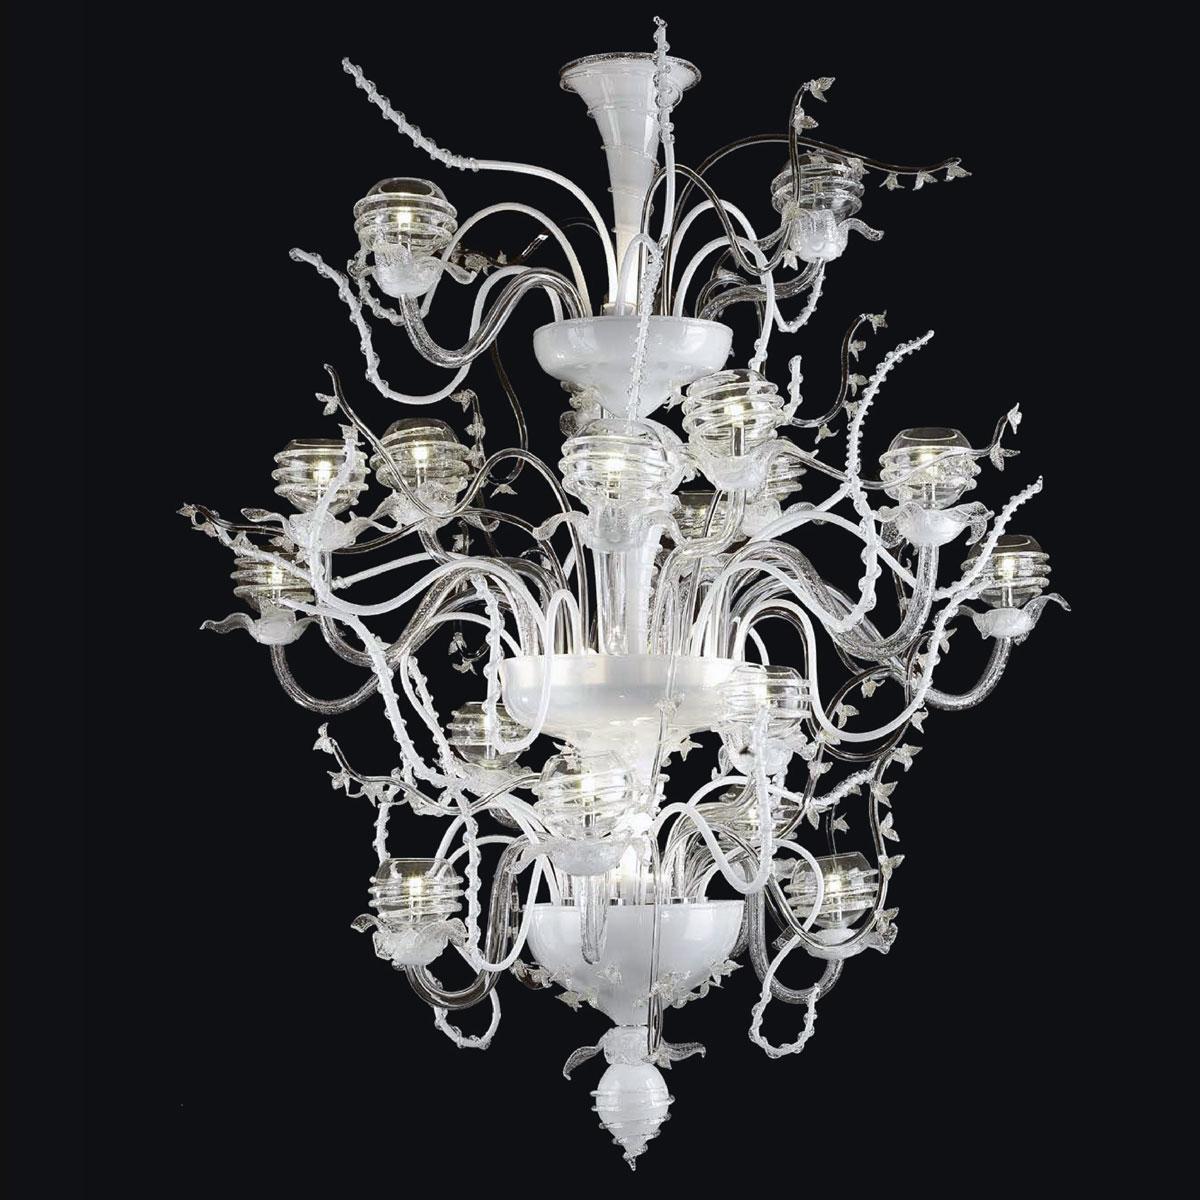 """Dakota"" Murano glass chandelier - 18+7 lights - transparent, white and silver"